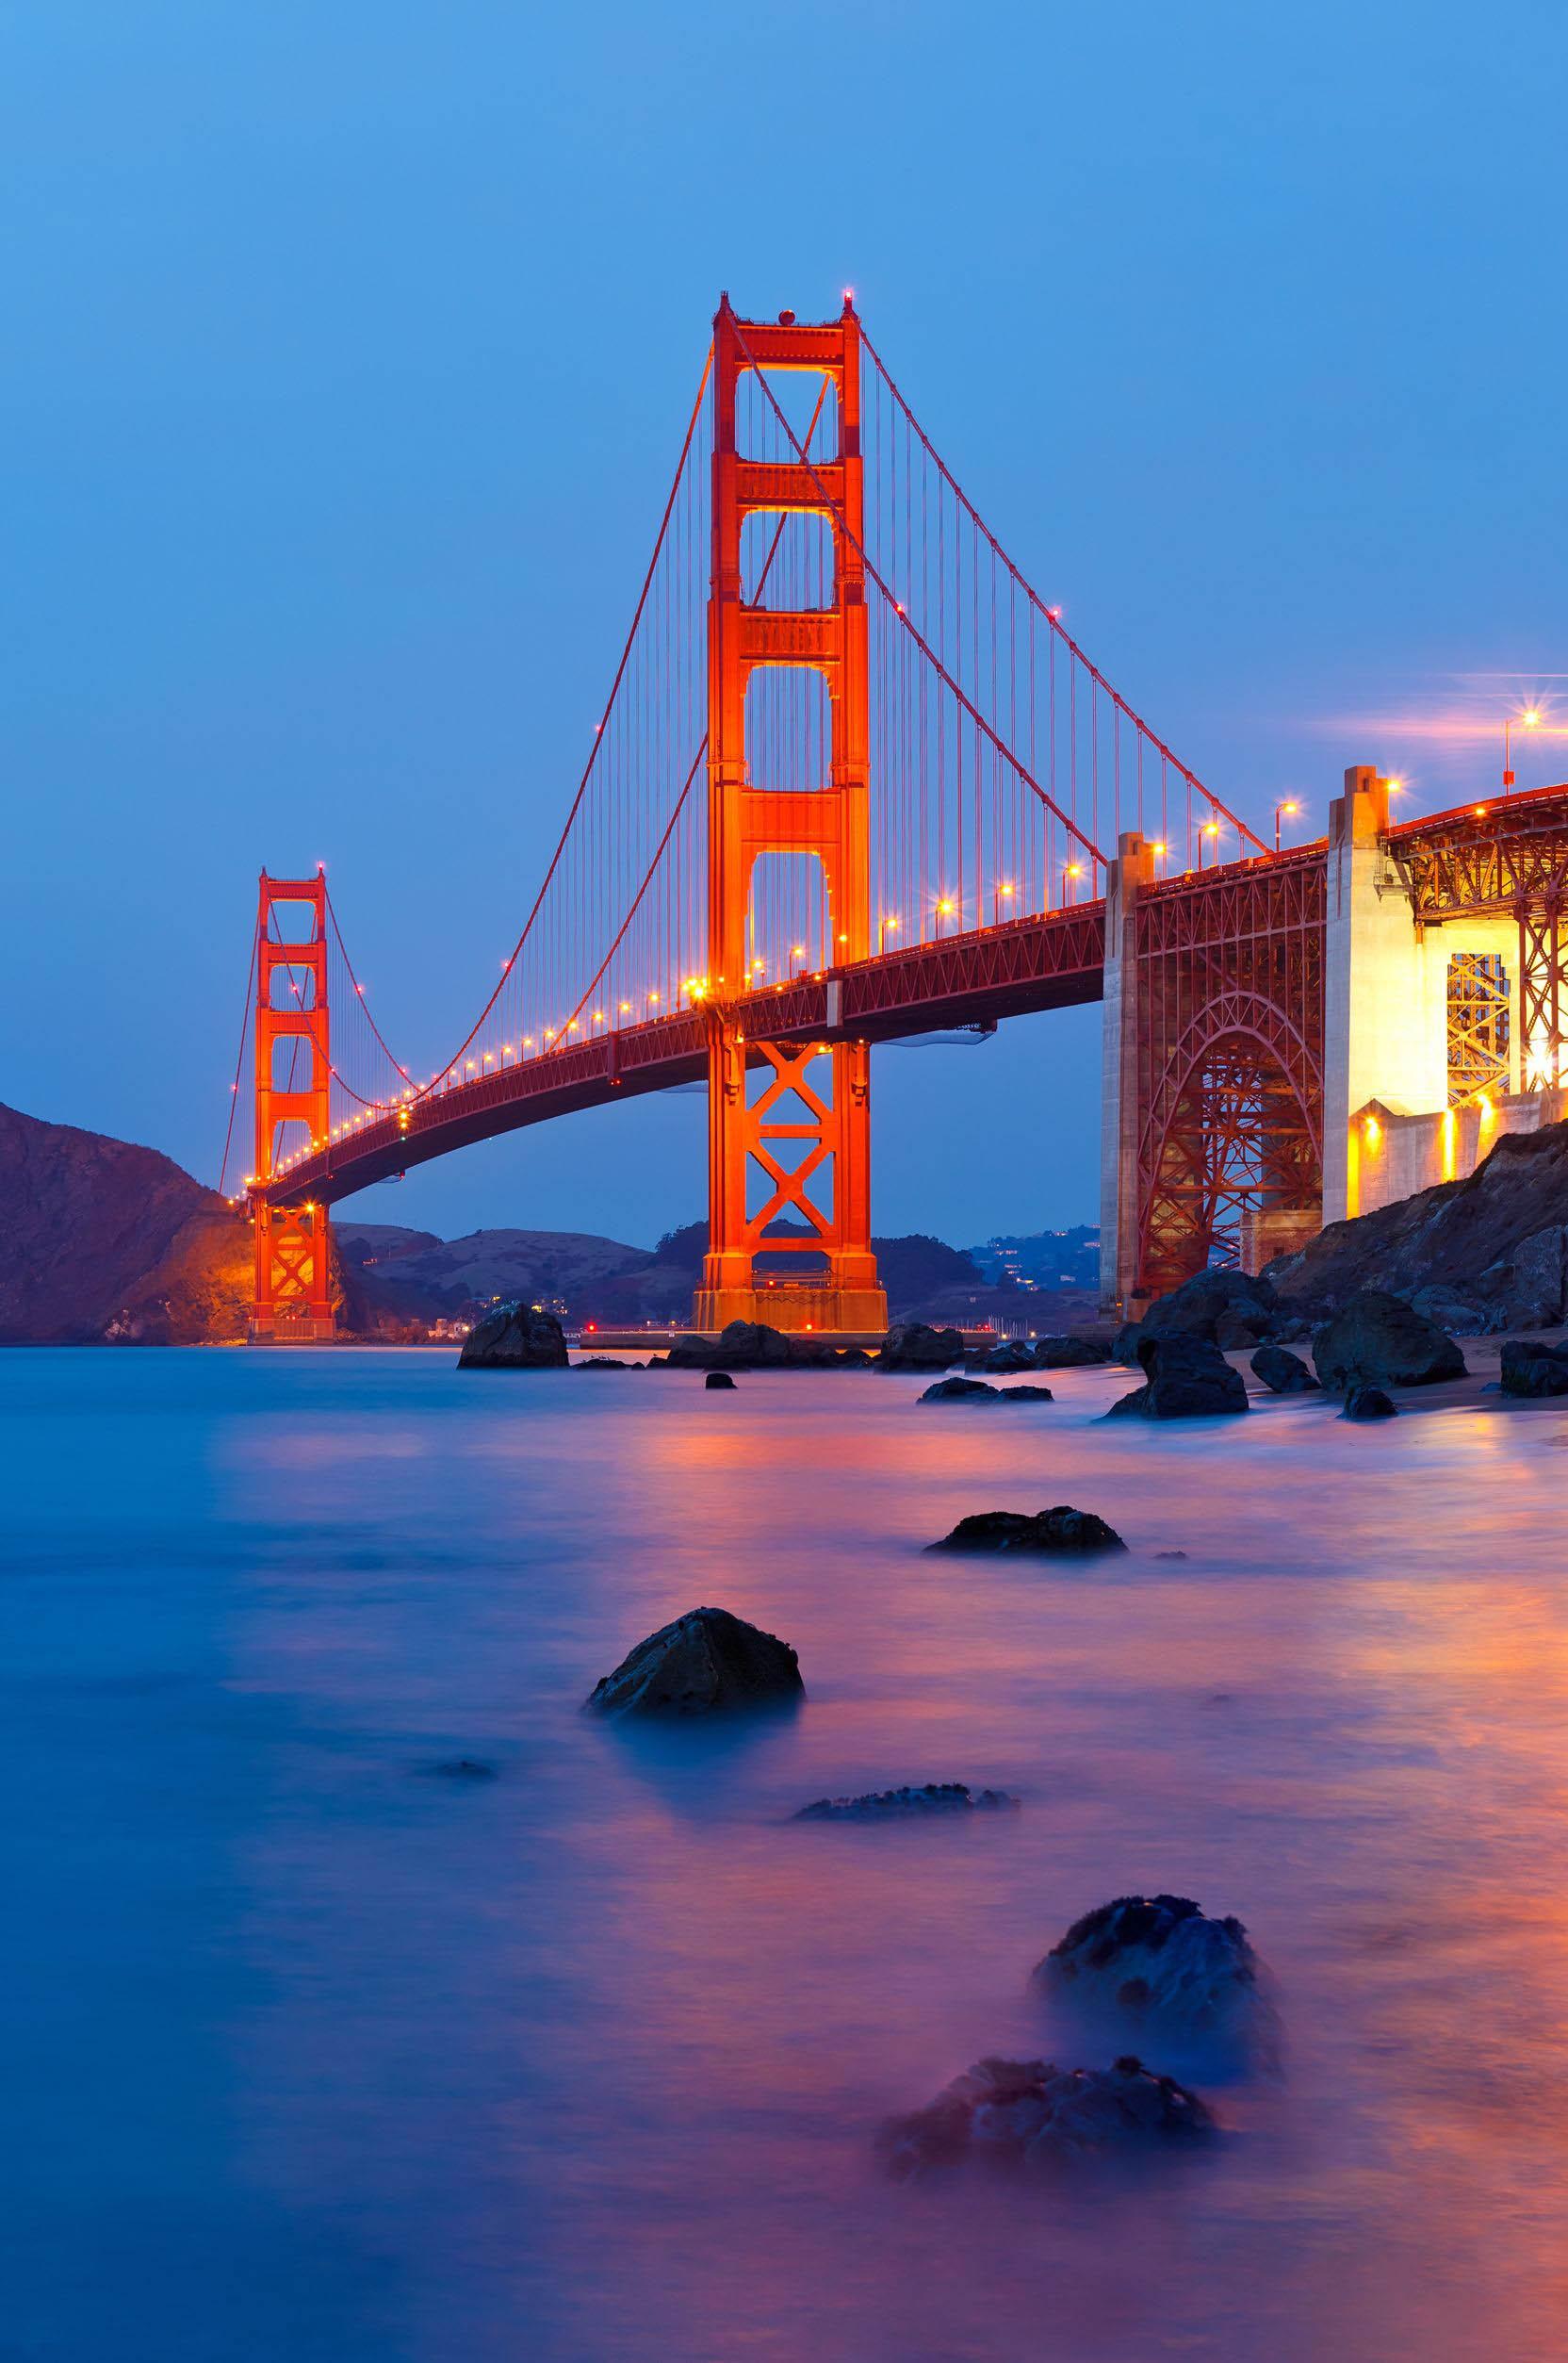 golden-gate-bridge-california-united-states